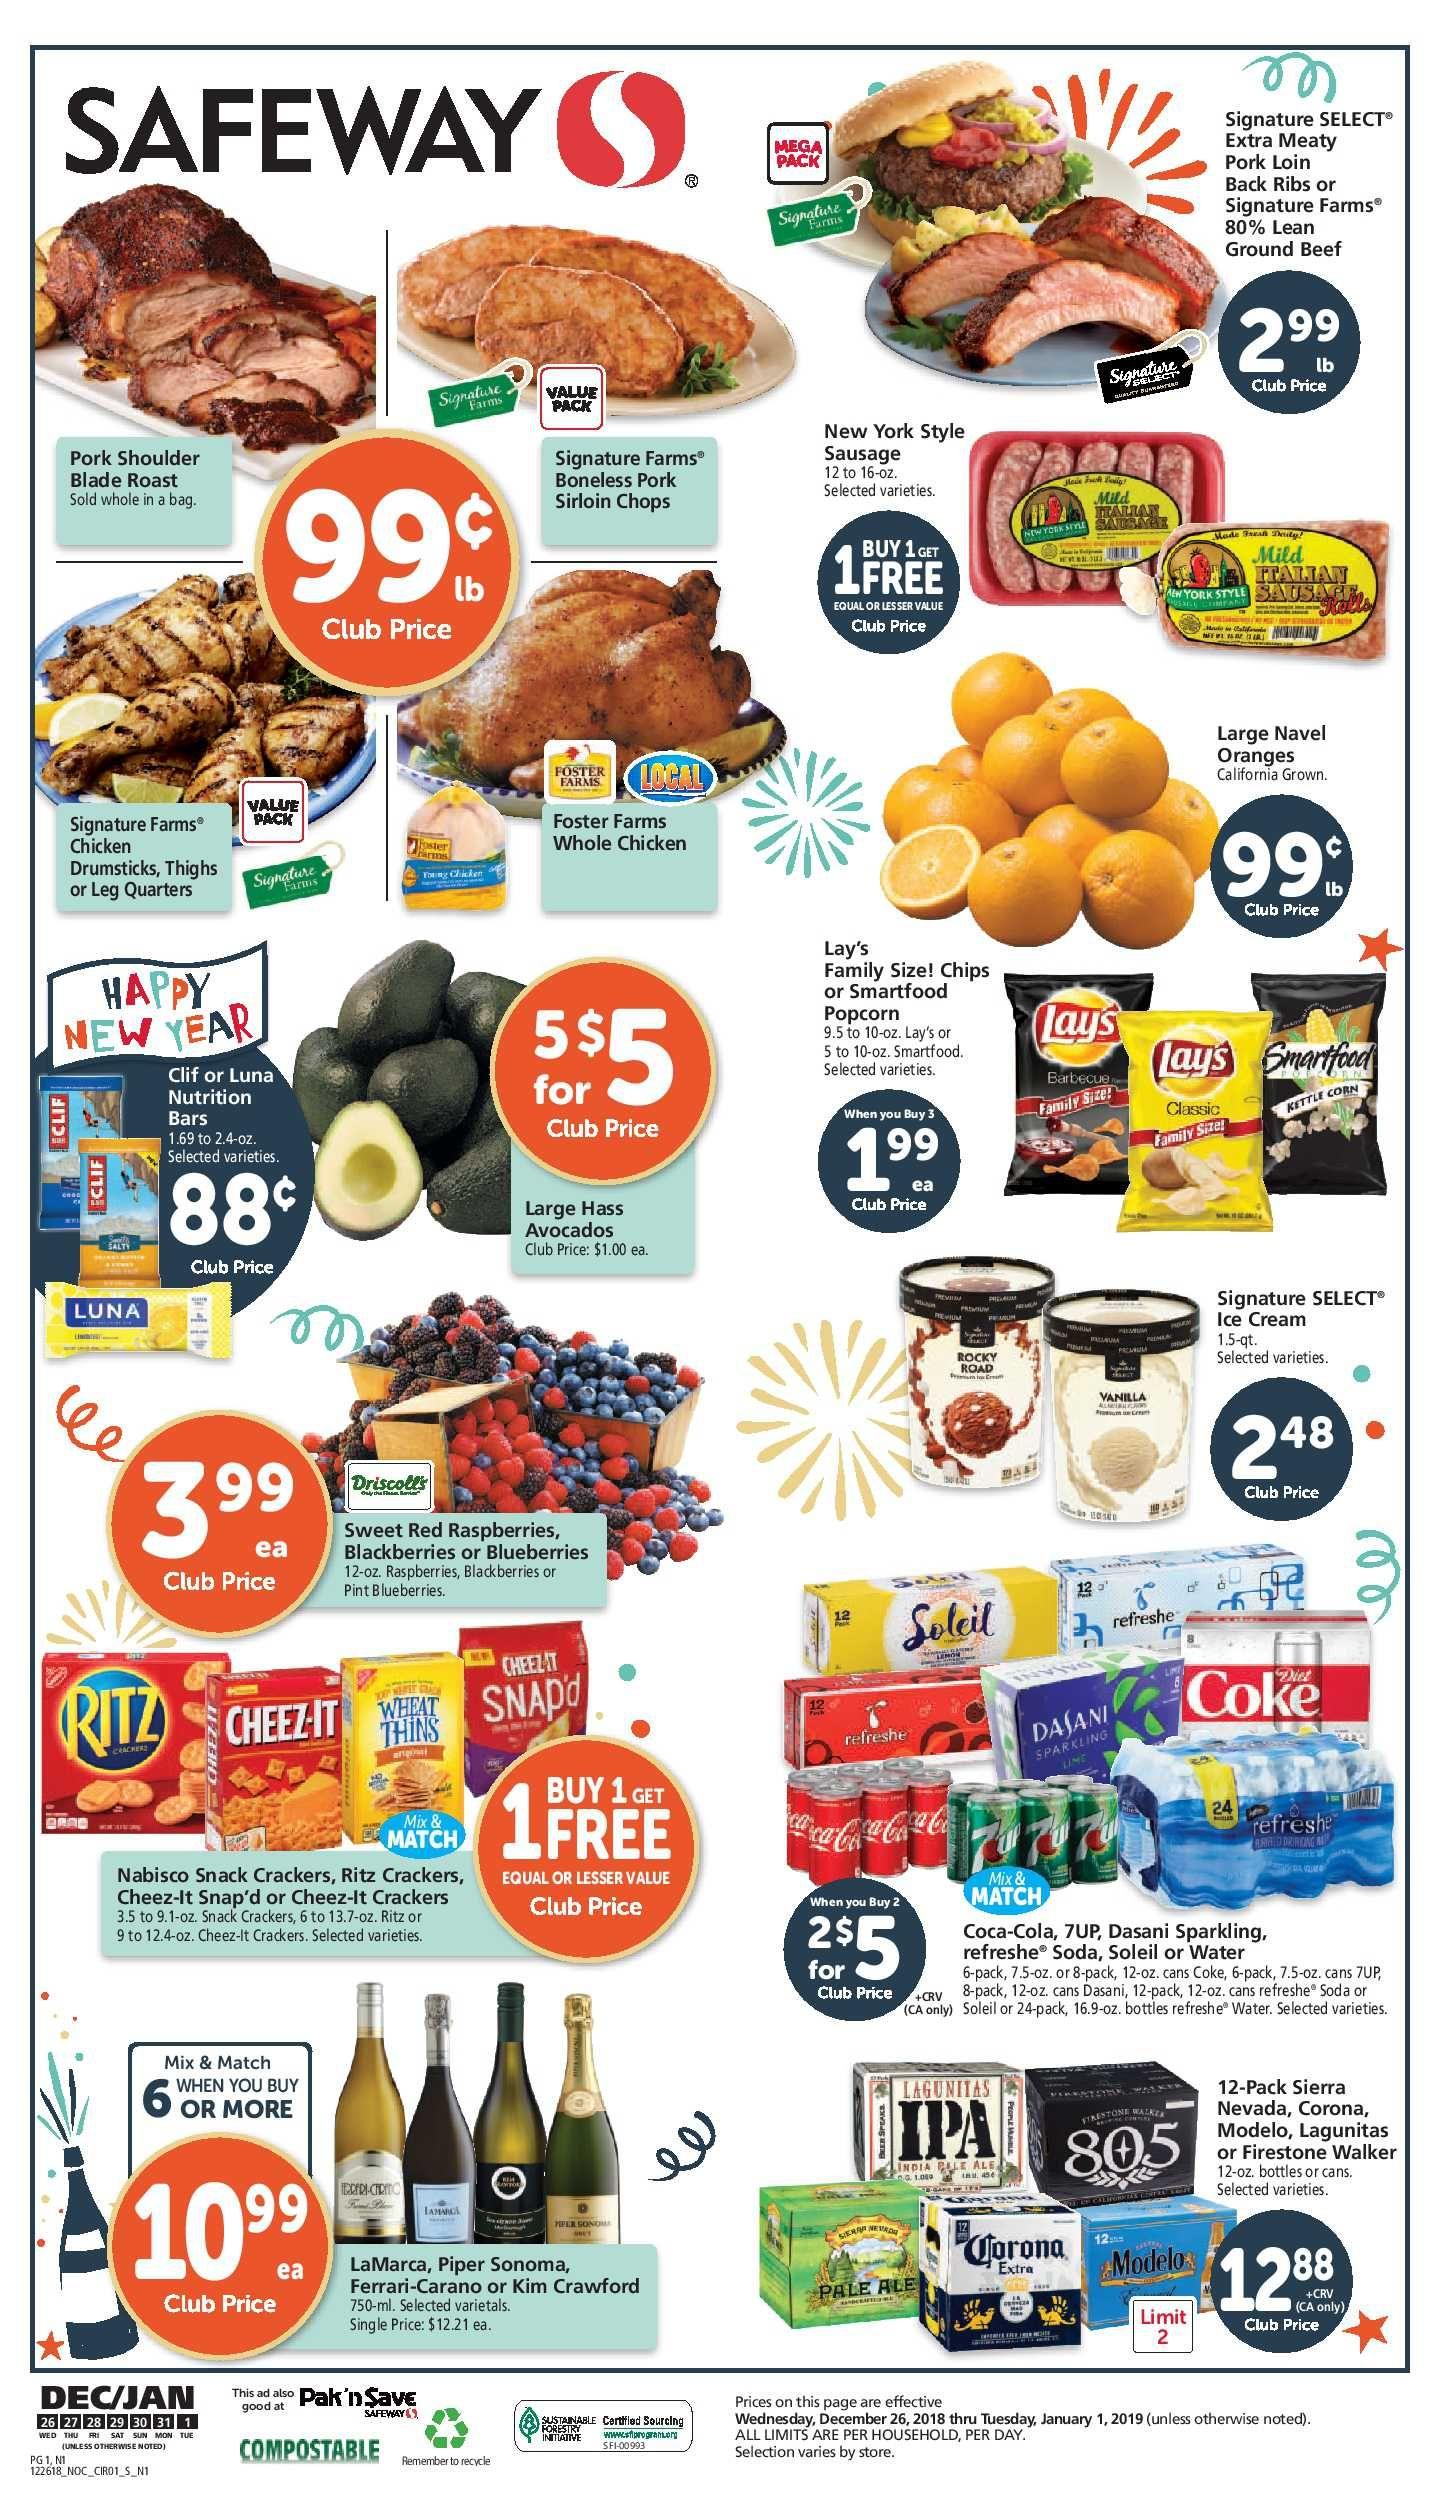 Safeway Weekly Ad Flyer 5 26 21 6 1 21 Weeklyad123 Com Weekly Ad Circular Grocery Stores Weekly Ads Safeway Grocery